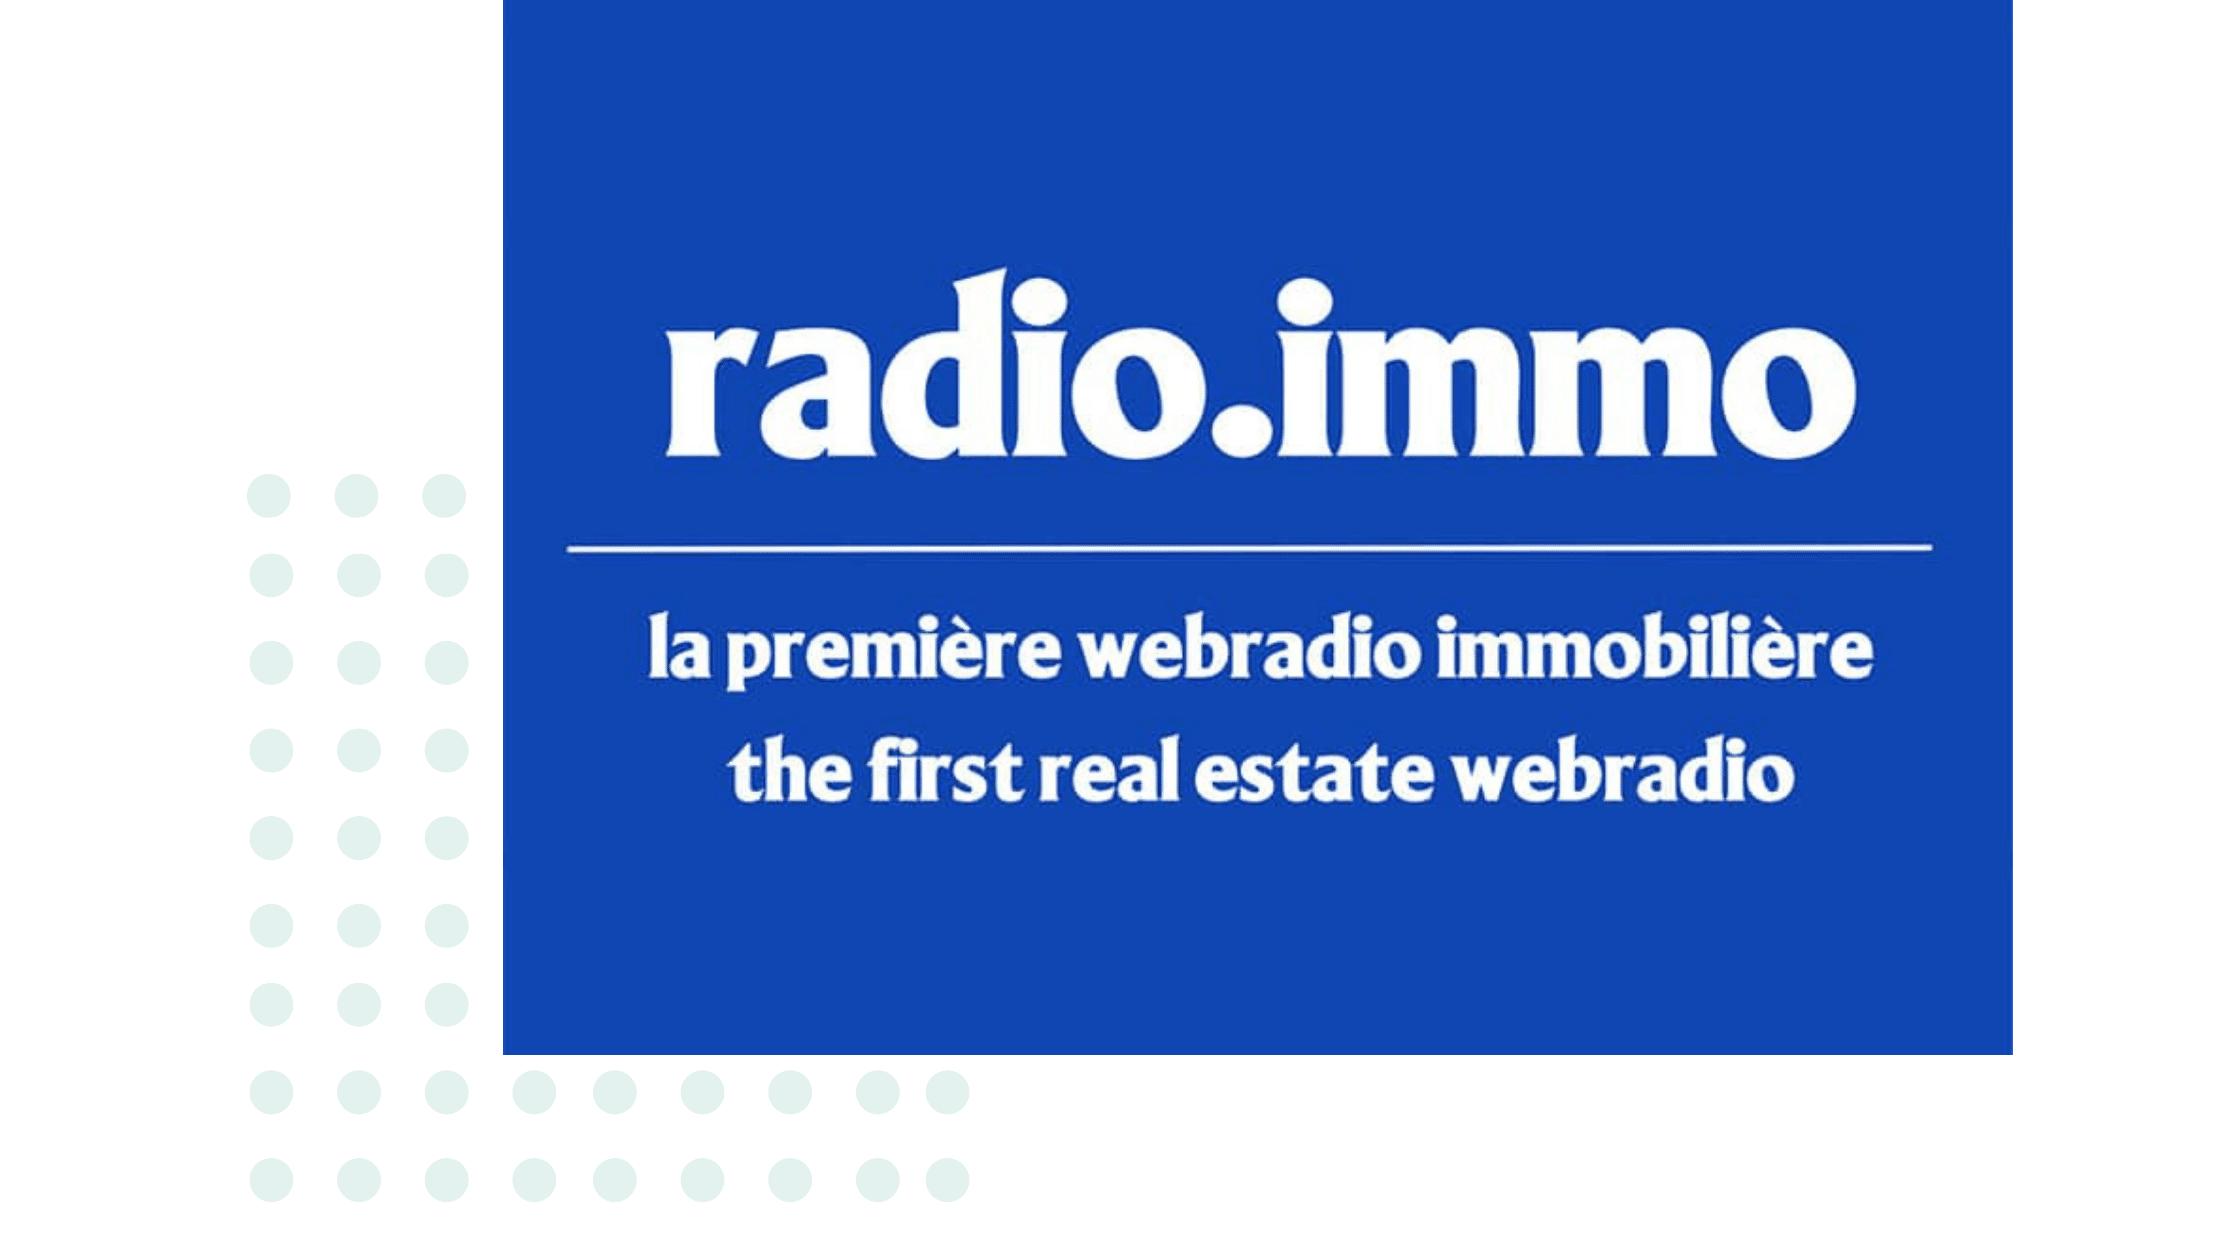 logo_radio_immo_media-immobilier_illustration